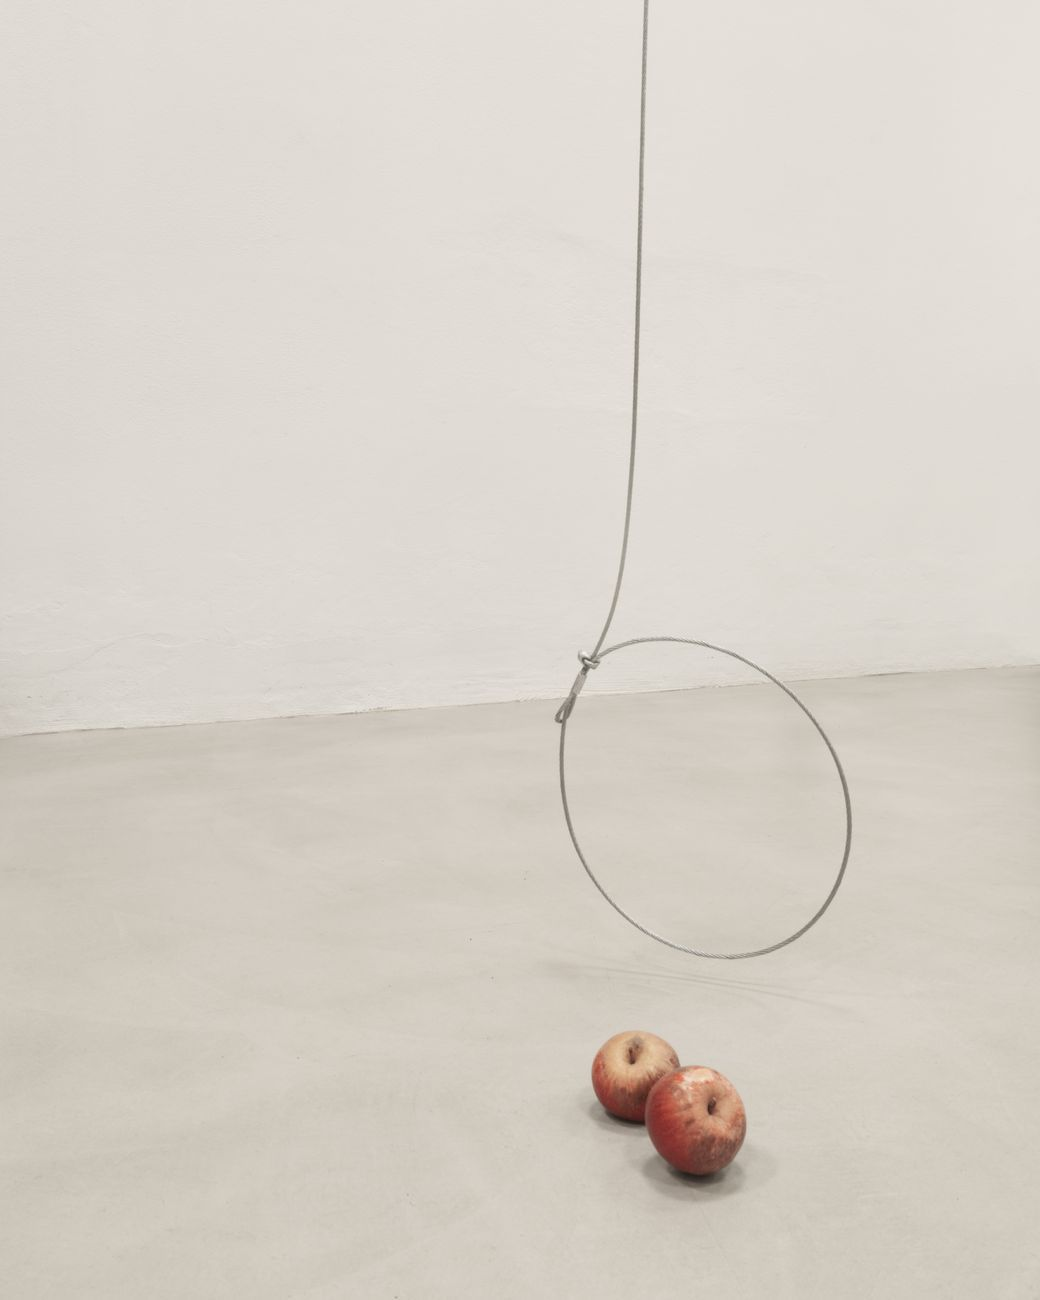 Edoardo Manzoni, Senza Titolo (Fame), 2020, cavo di acciaio e mele. Courtesy the artist and State Of. Photo credits Francesco Spallacci